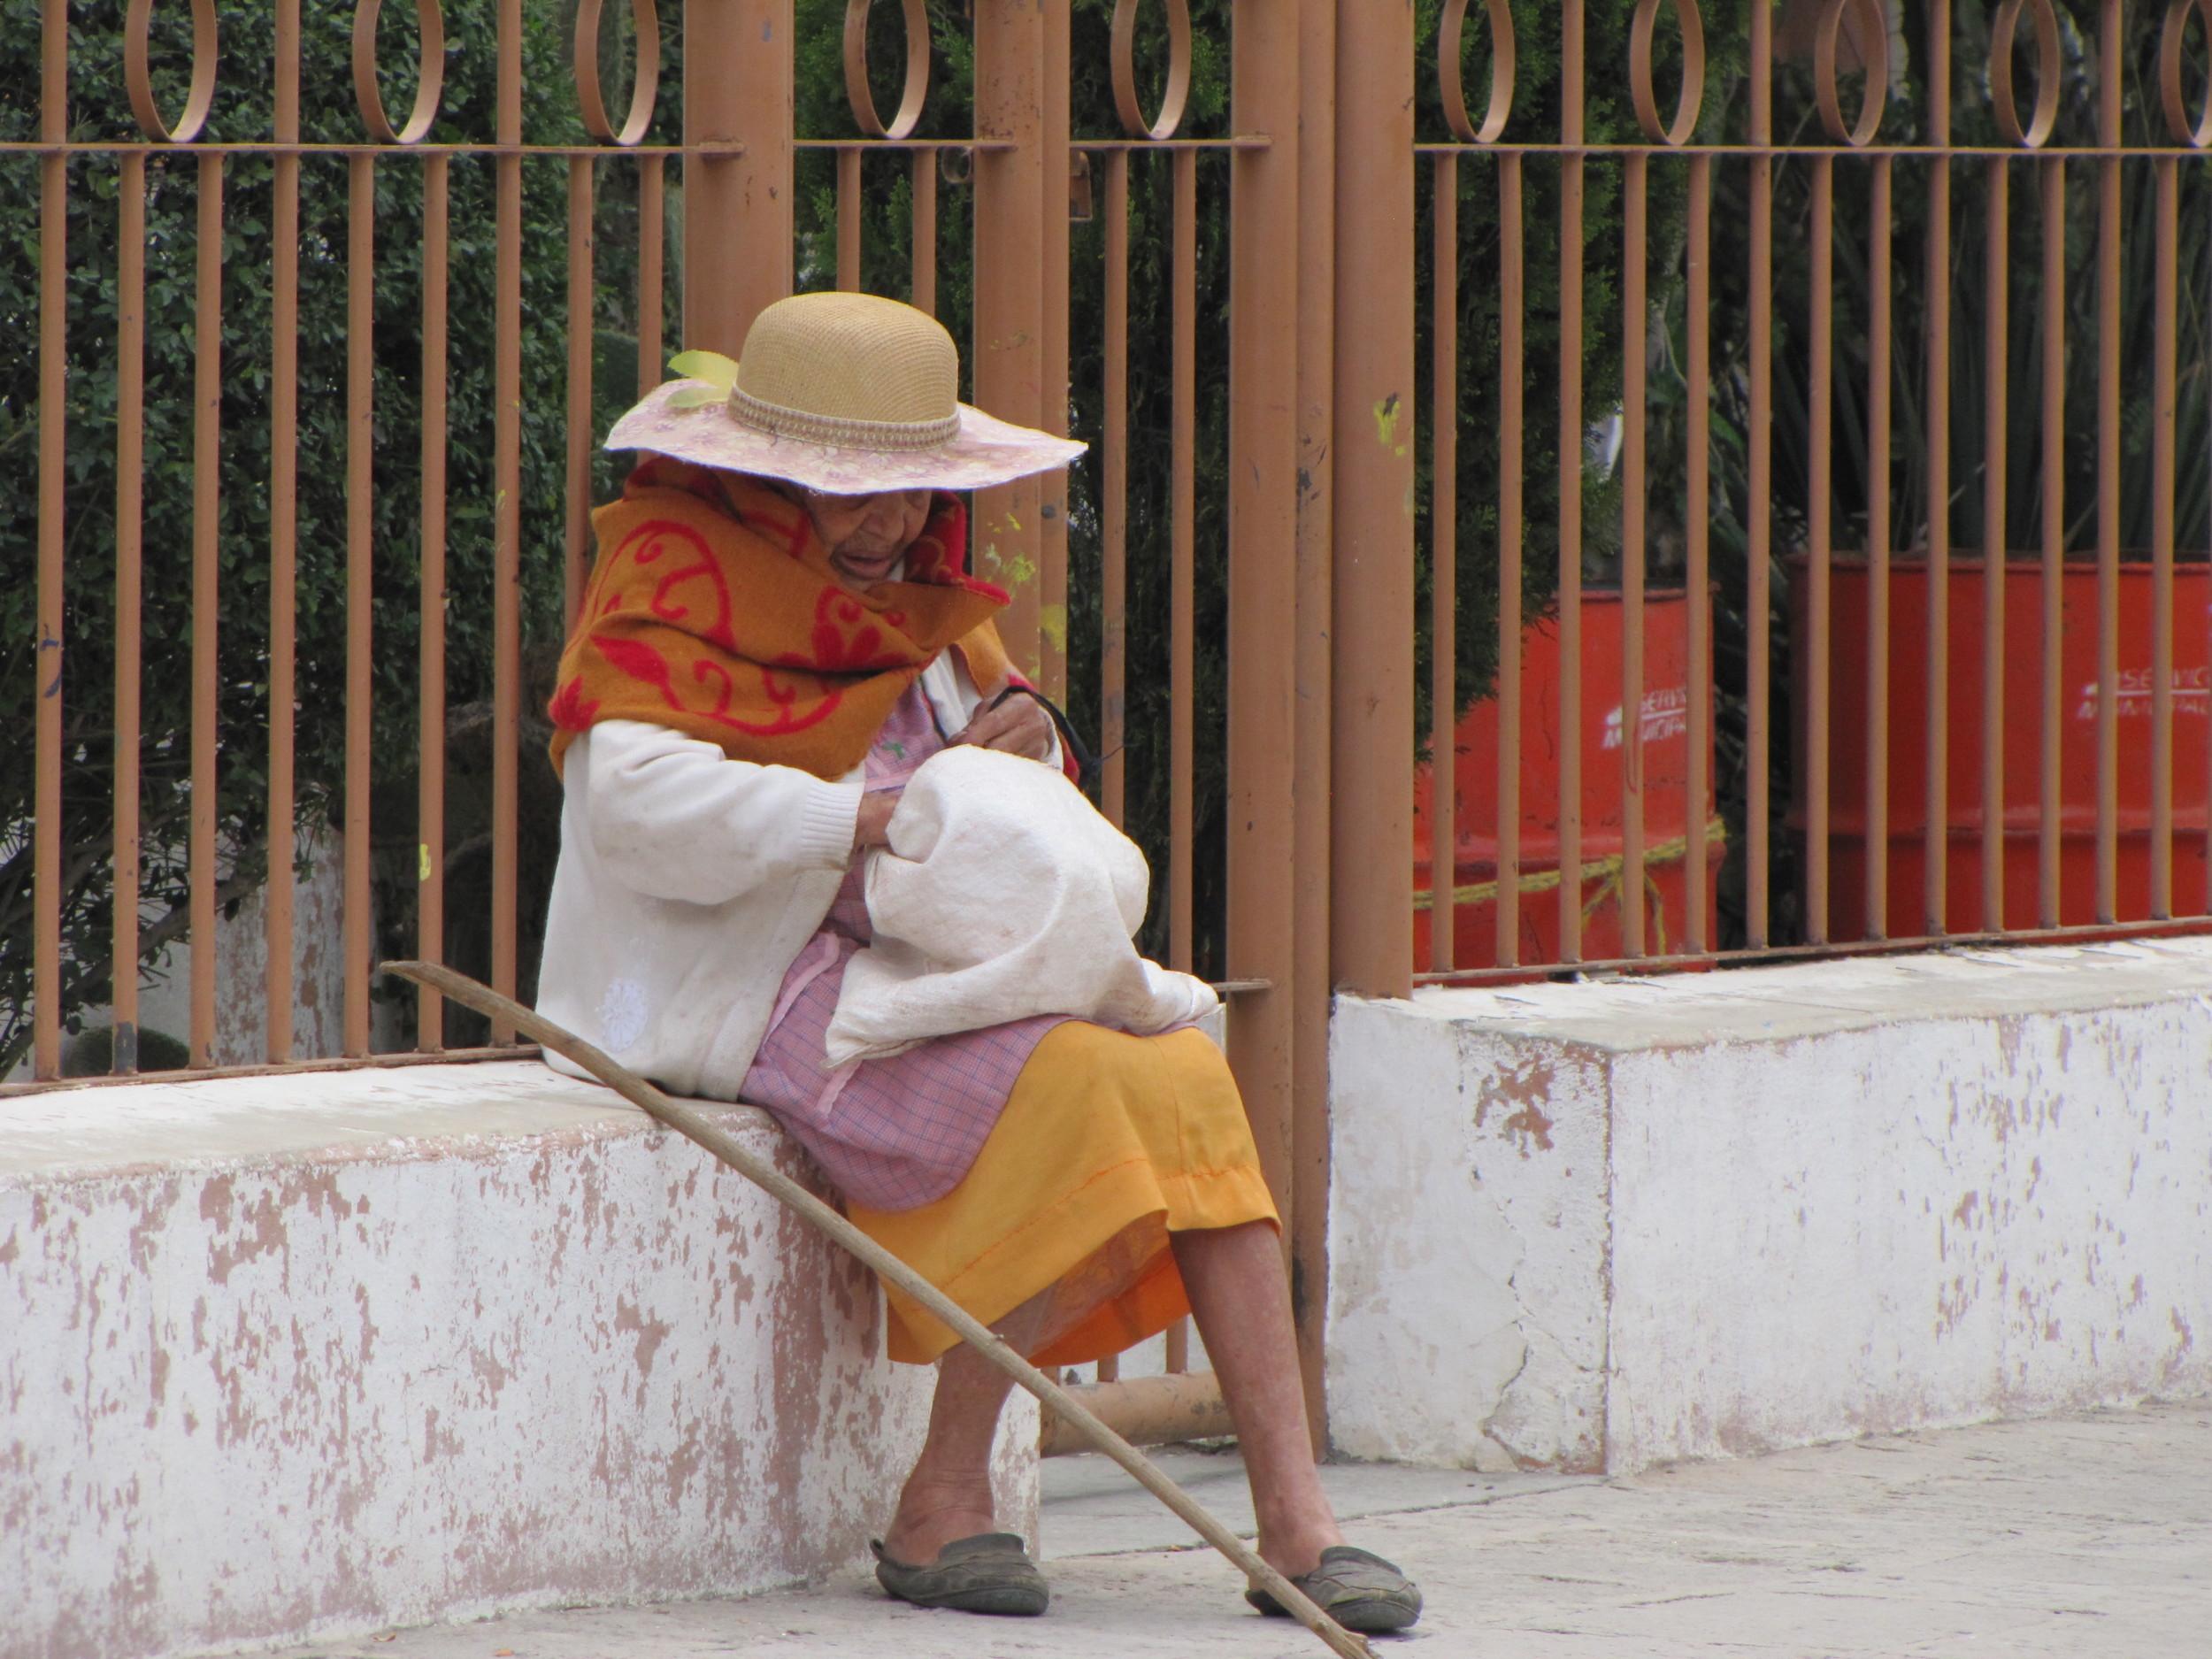 Old lady hat .JPG